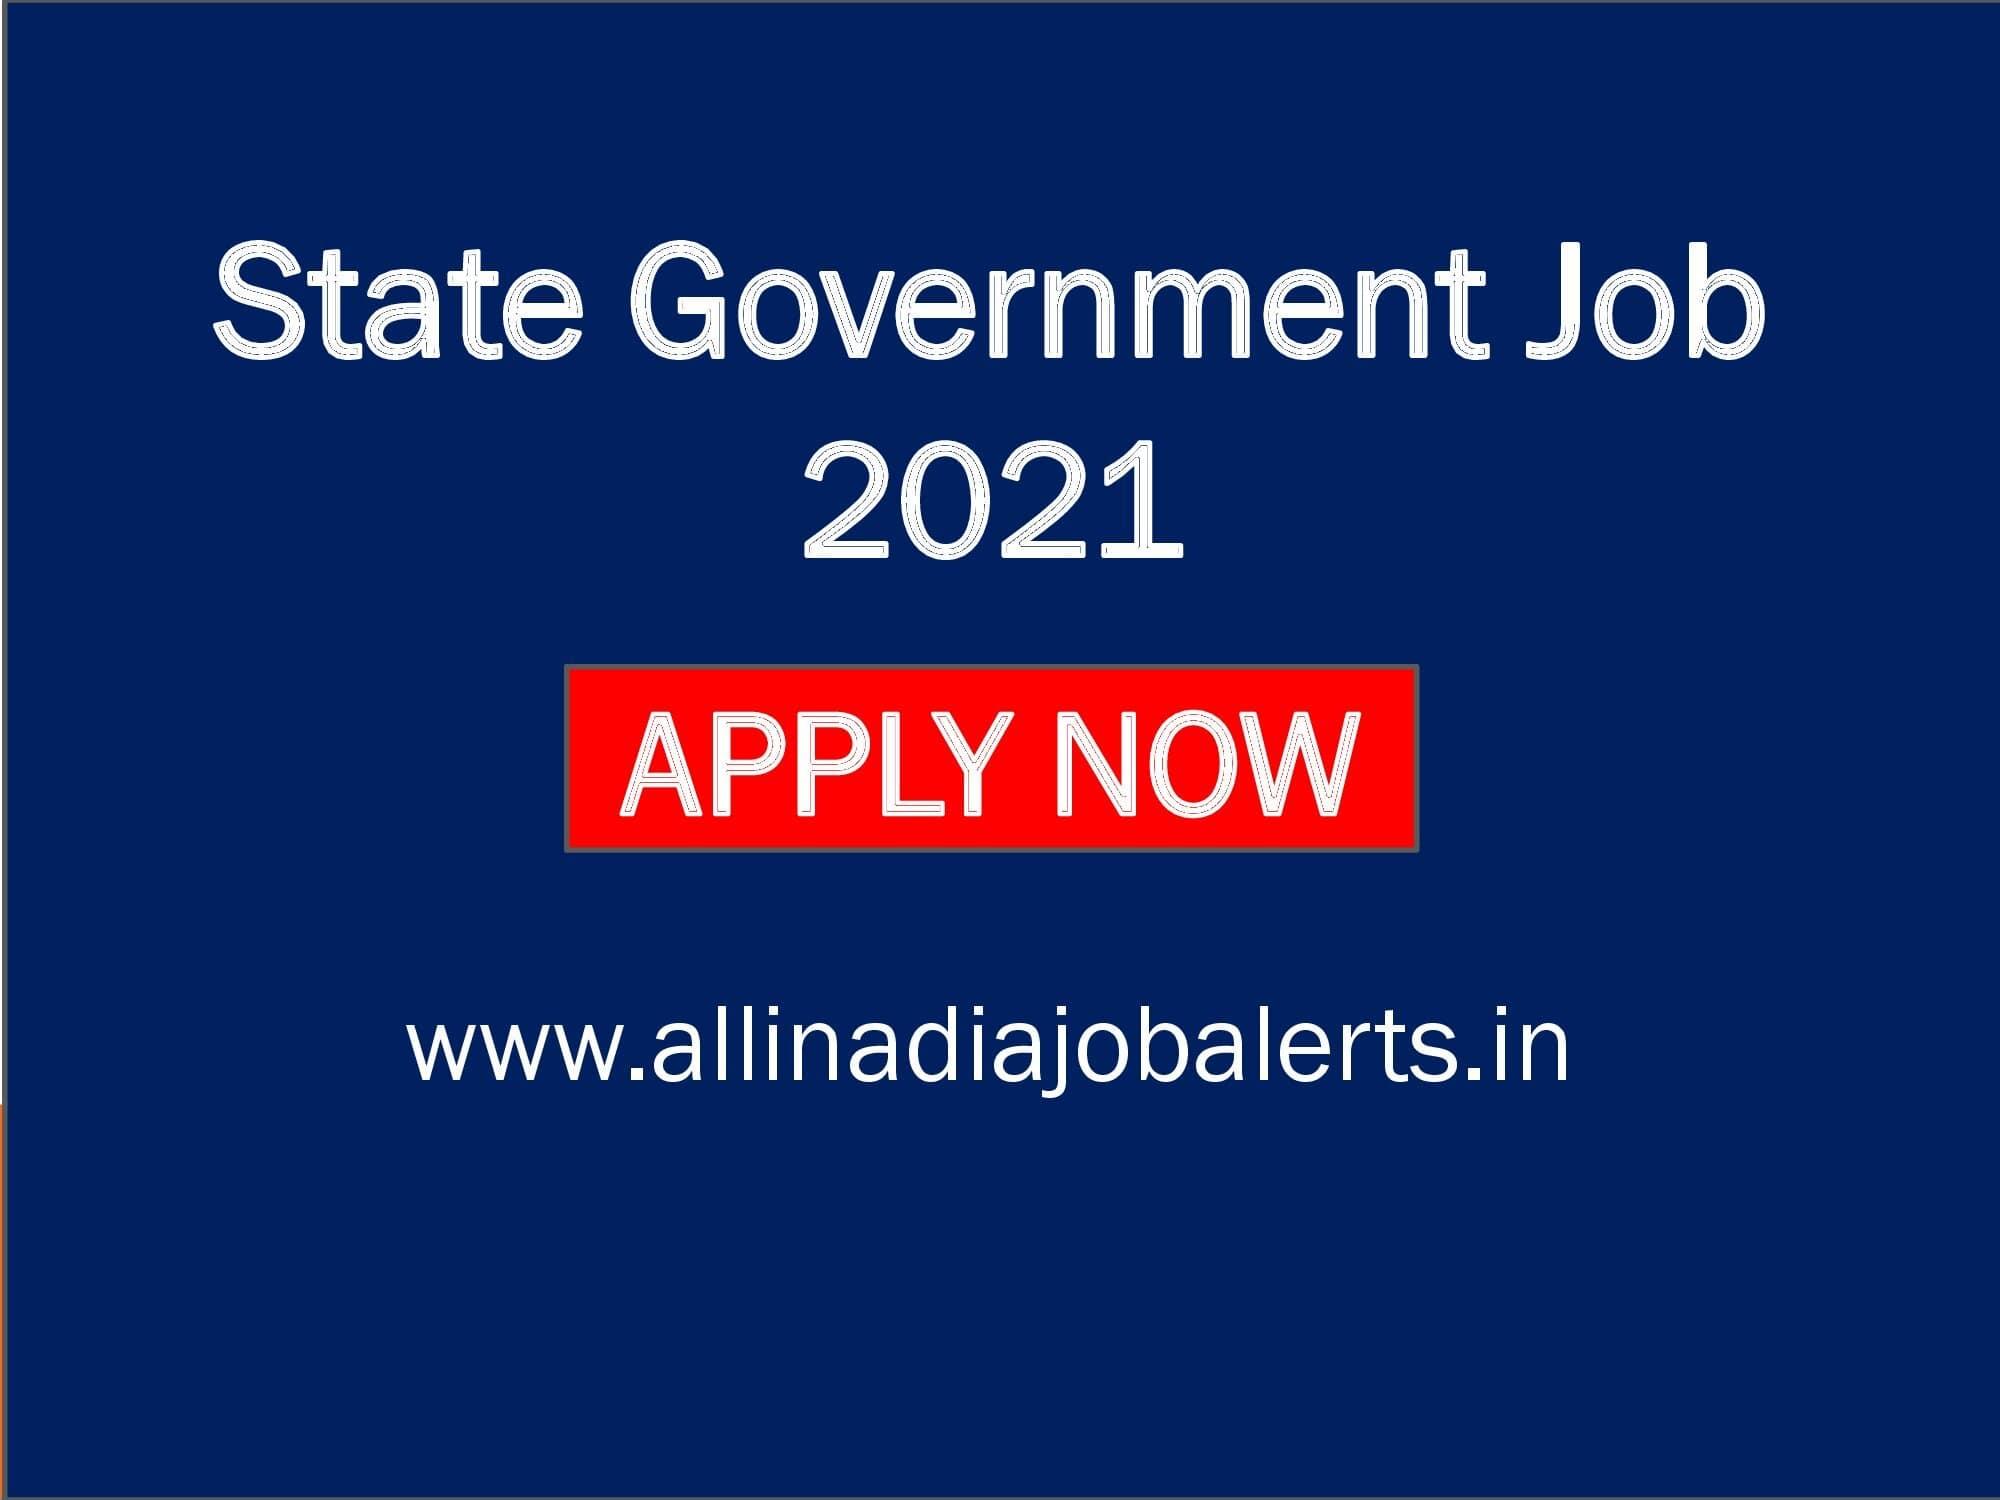 Govt Jobs Bangalore, State Govt Job 2021